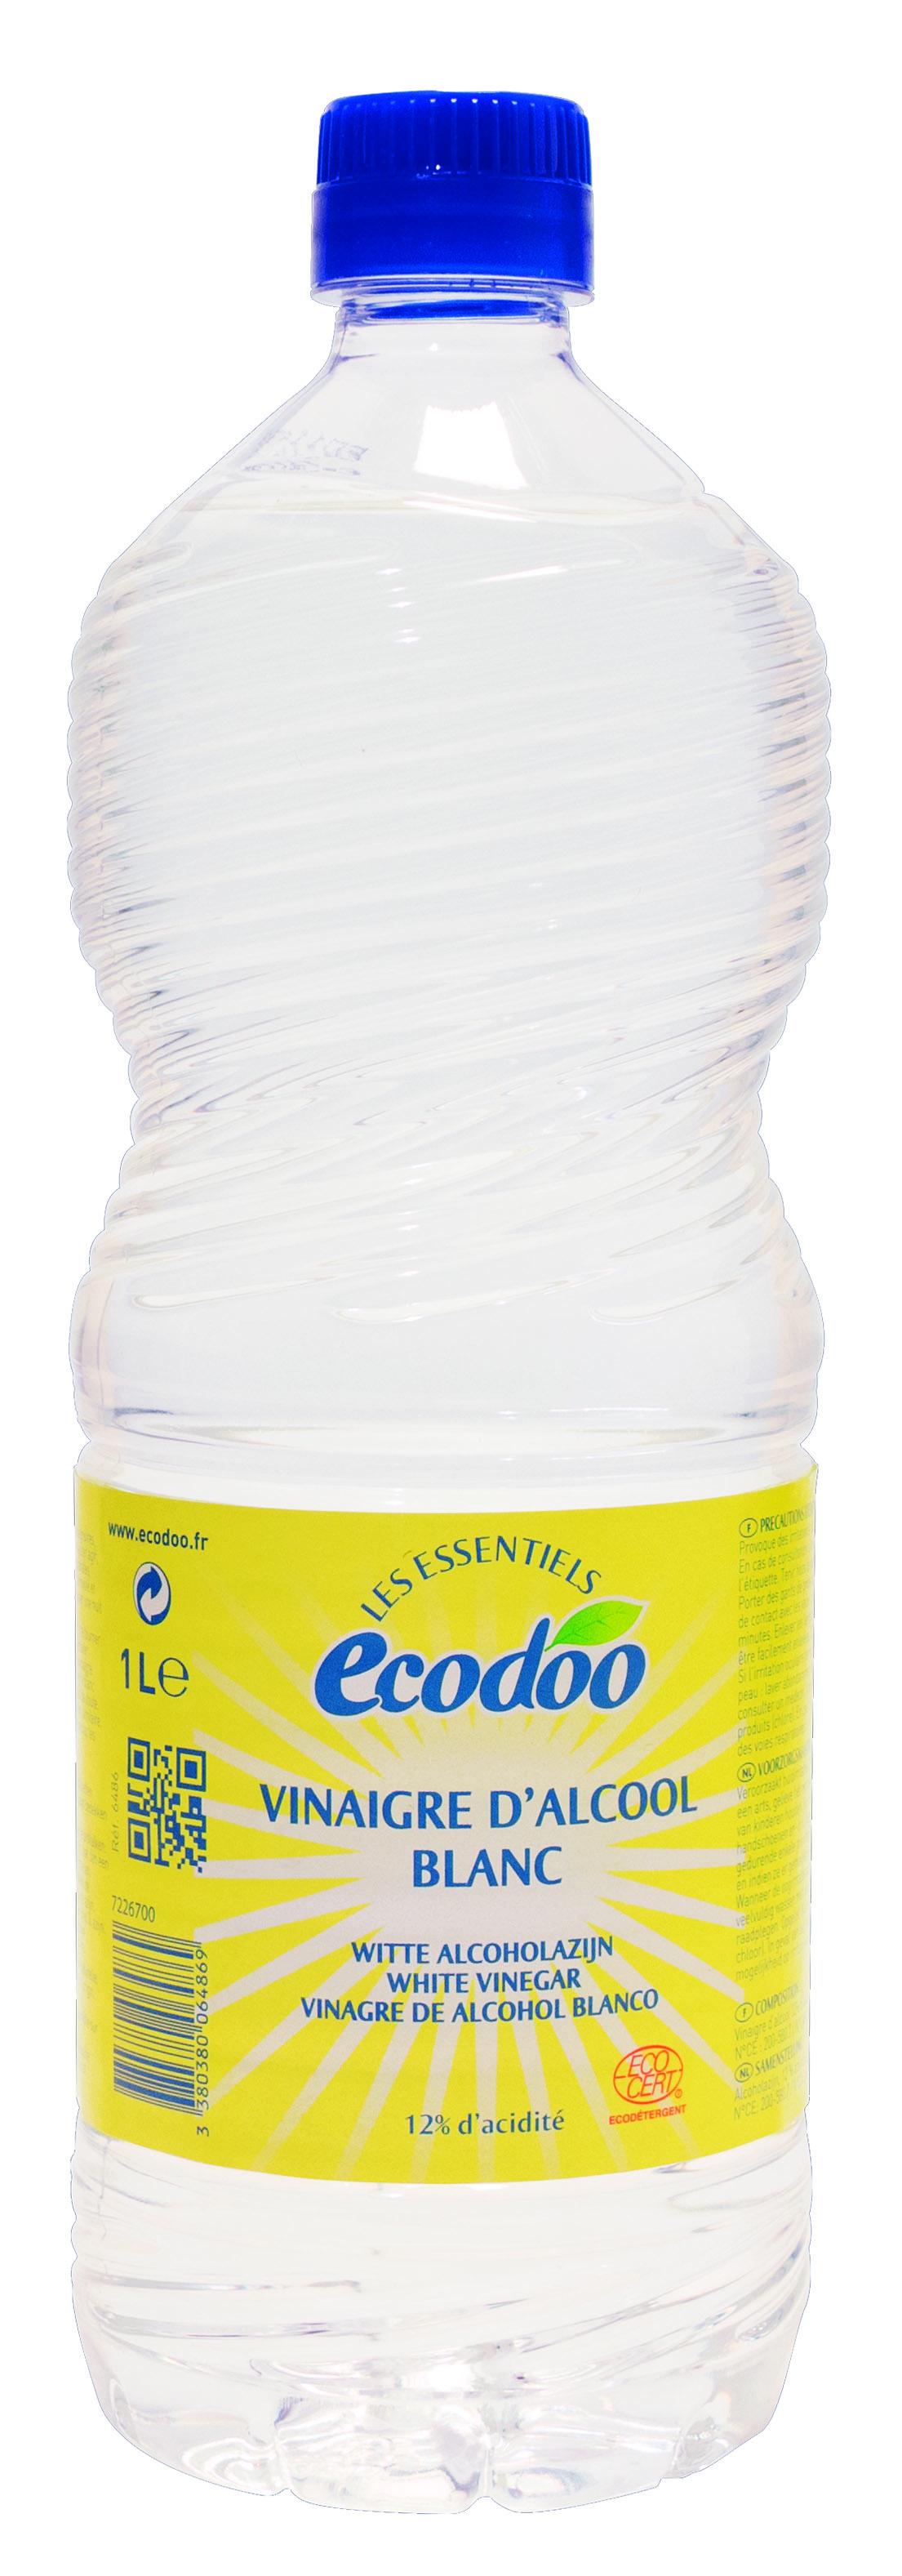 Vinaigre d'alcool blanc 12%, Ecodoo (1 L)